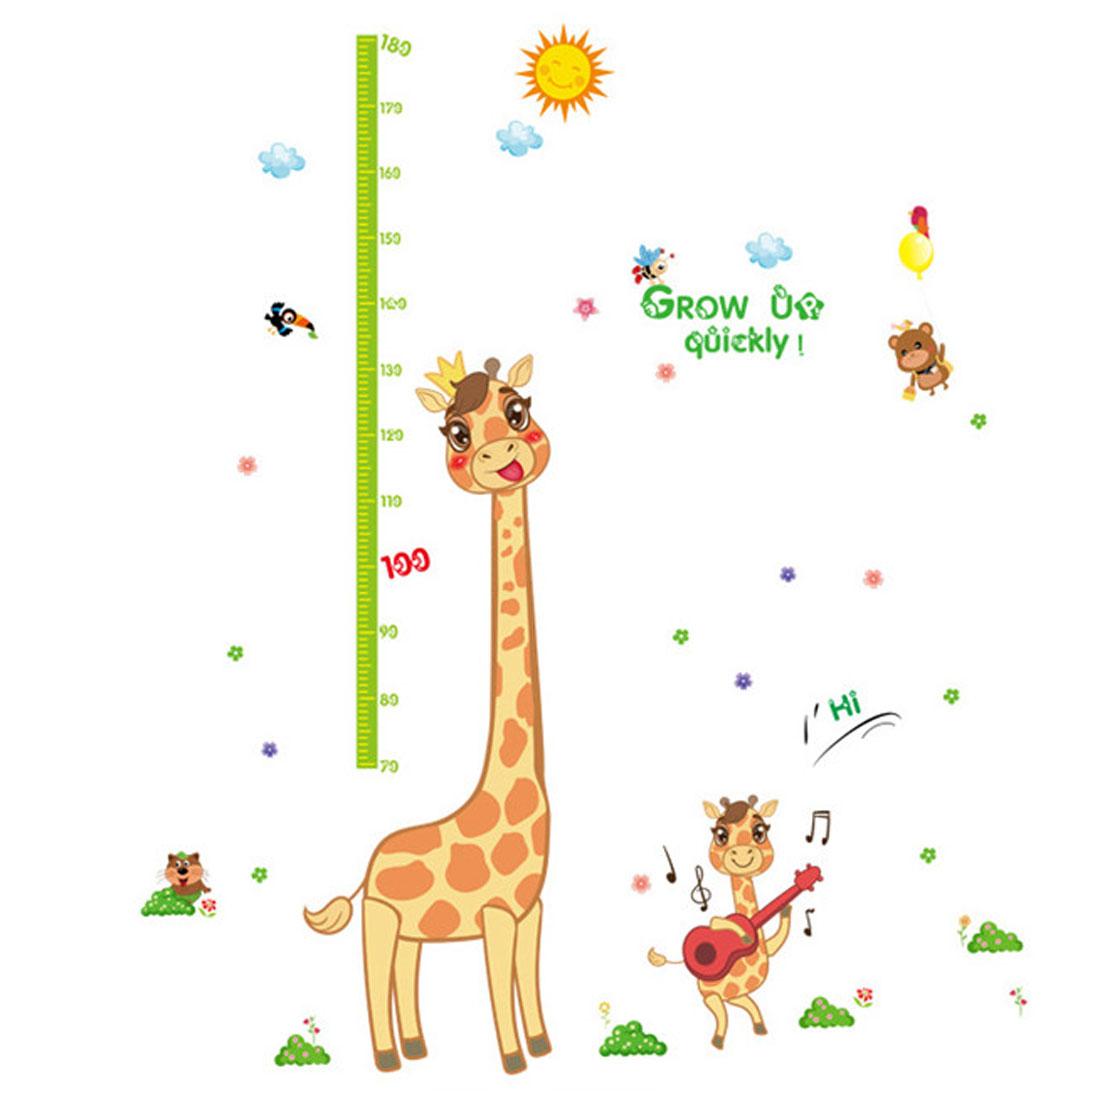 Home Bedroom PVC Giraffe Grass Print Self-adhesive Decoration Wall Sticker Decal Multicolor